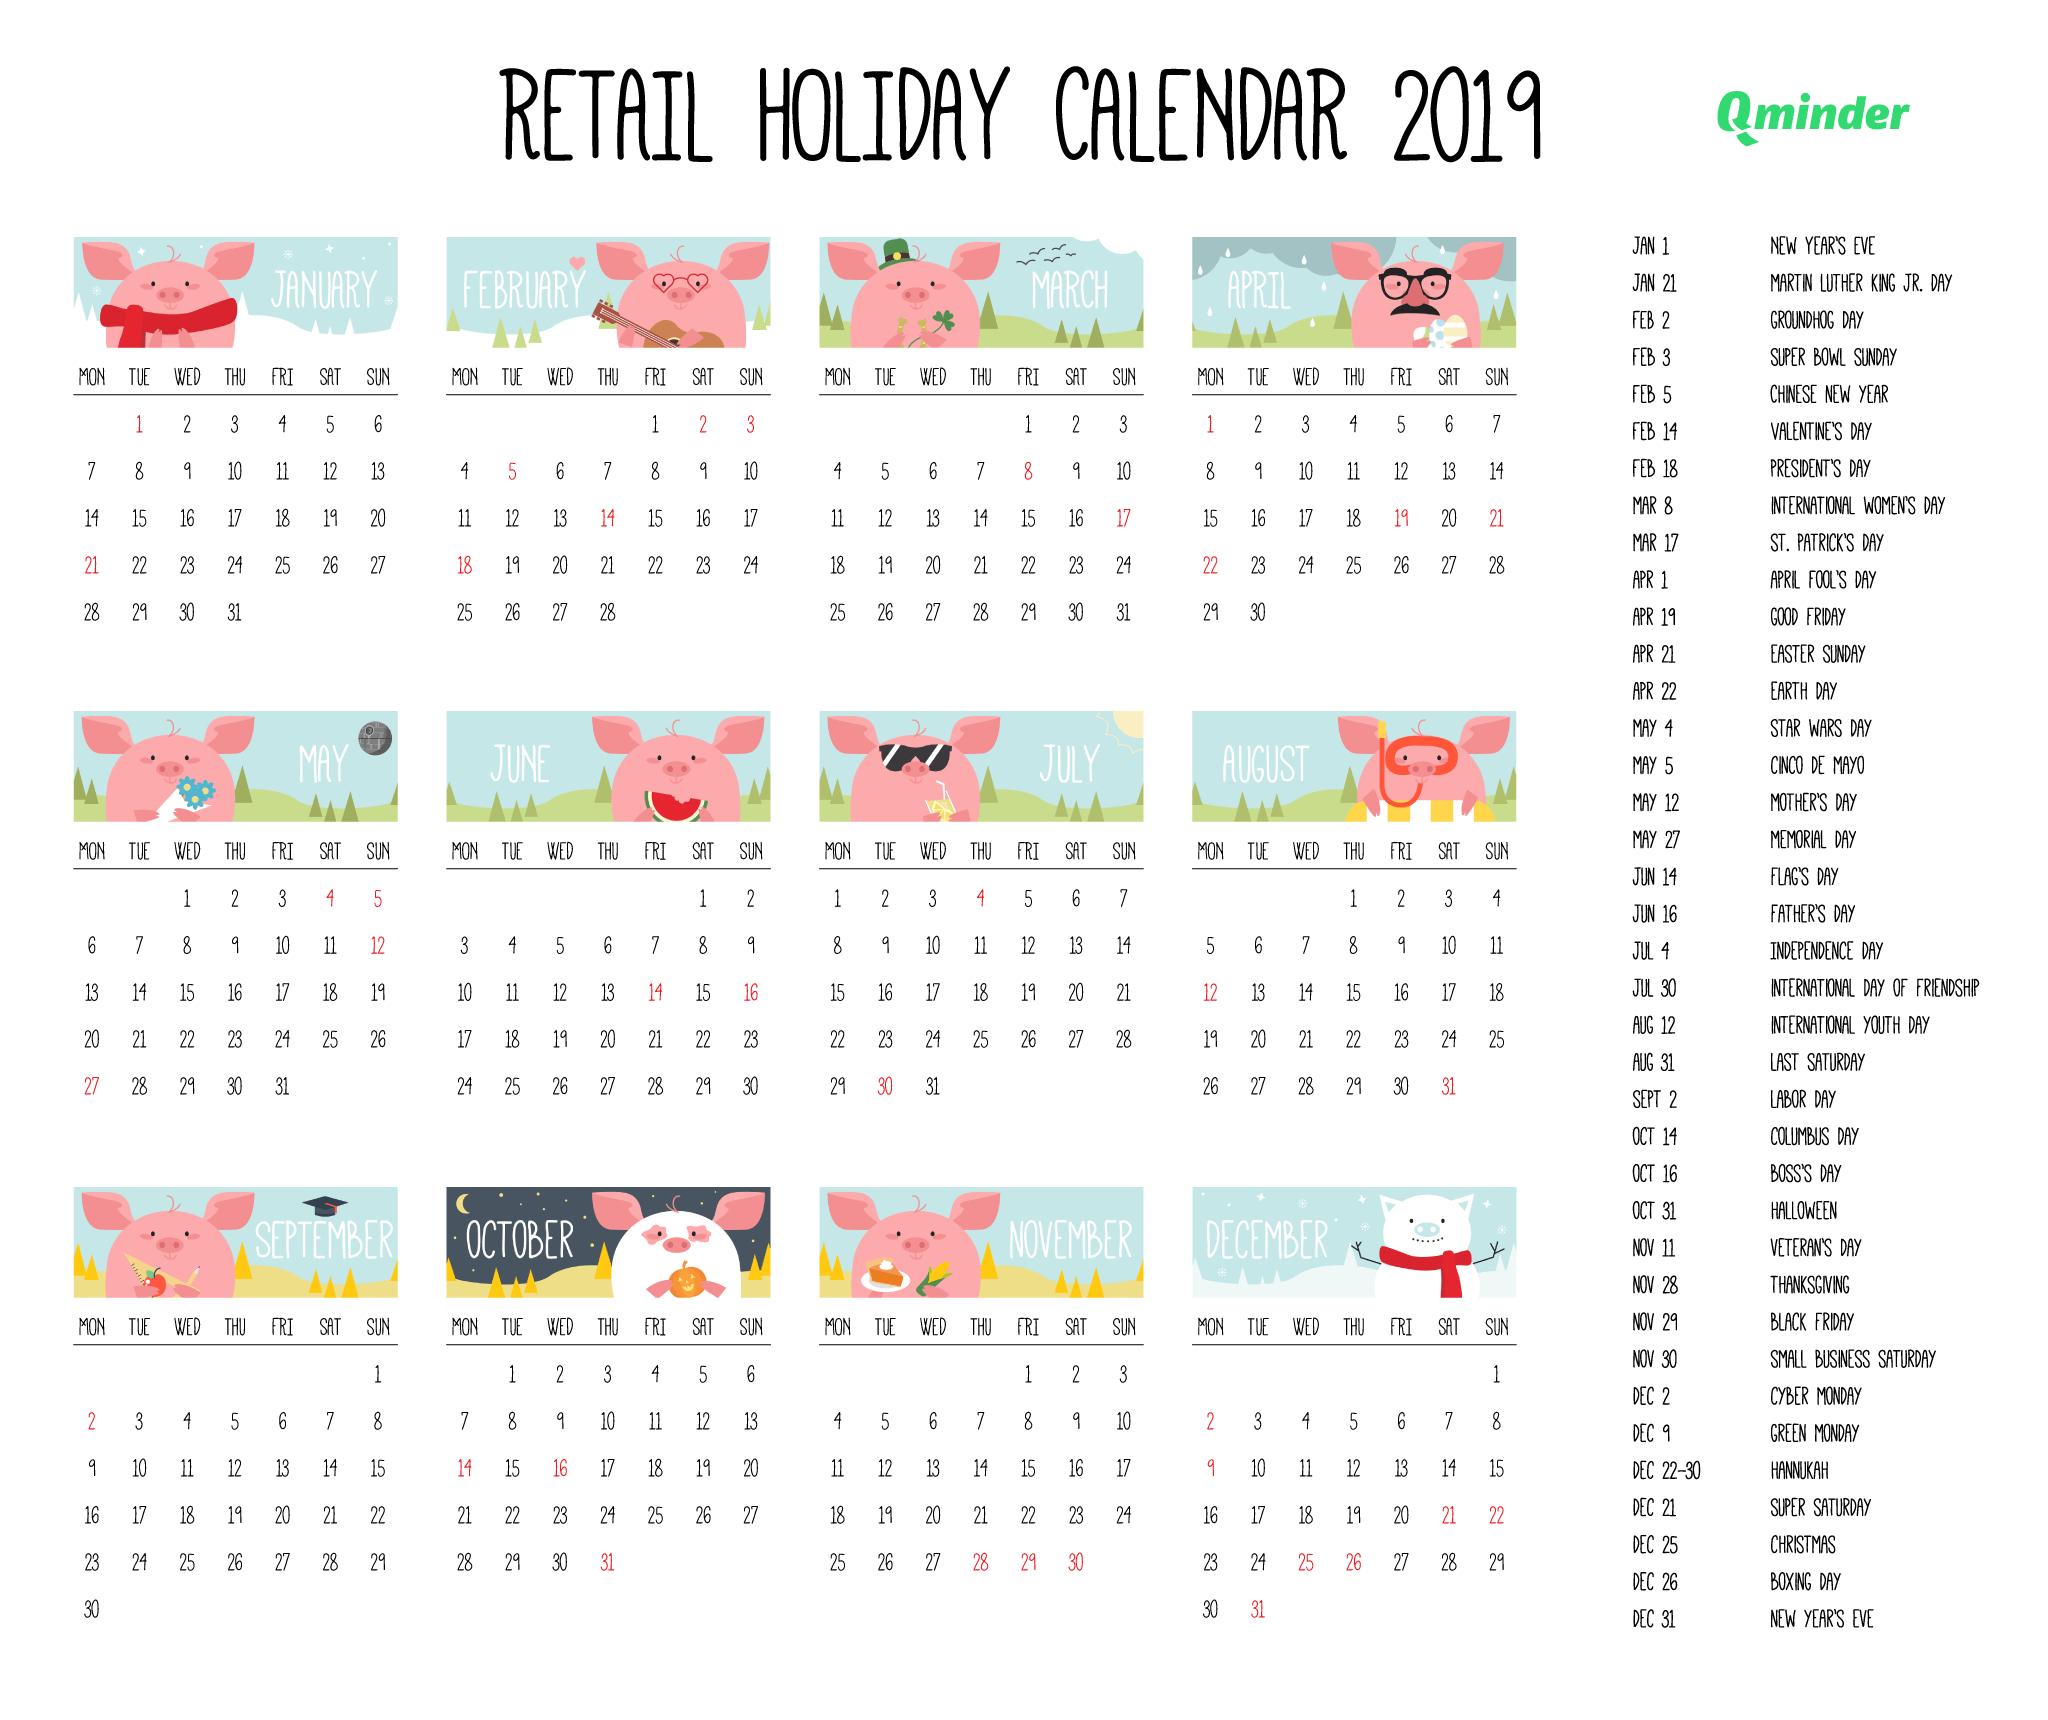 2019 Retail Holiday Calendar | Qminder Calendar Of 2019 With Holidays